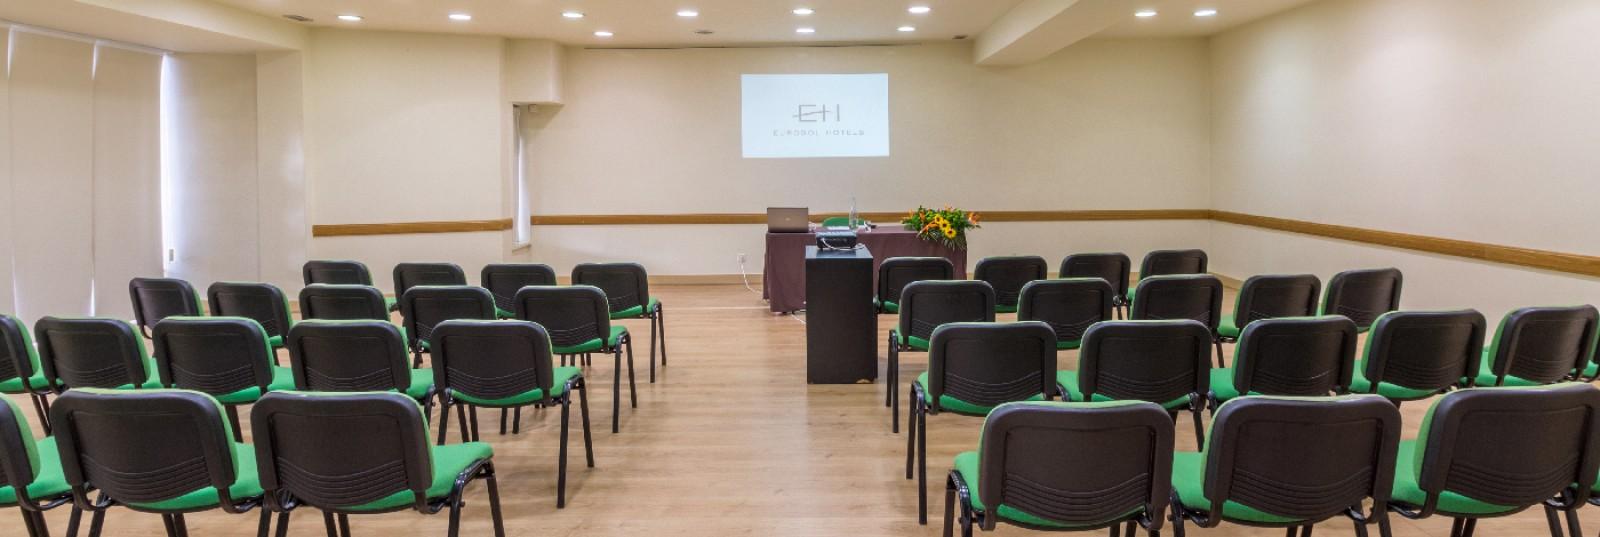 Hotel Eurosol Leiria meeting room